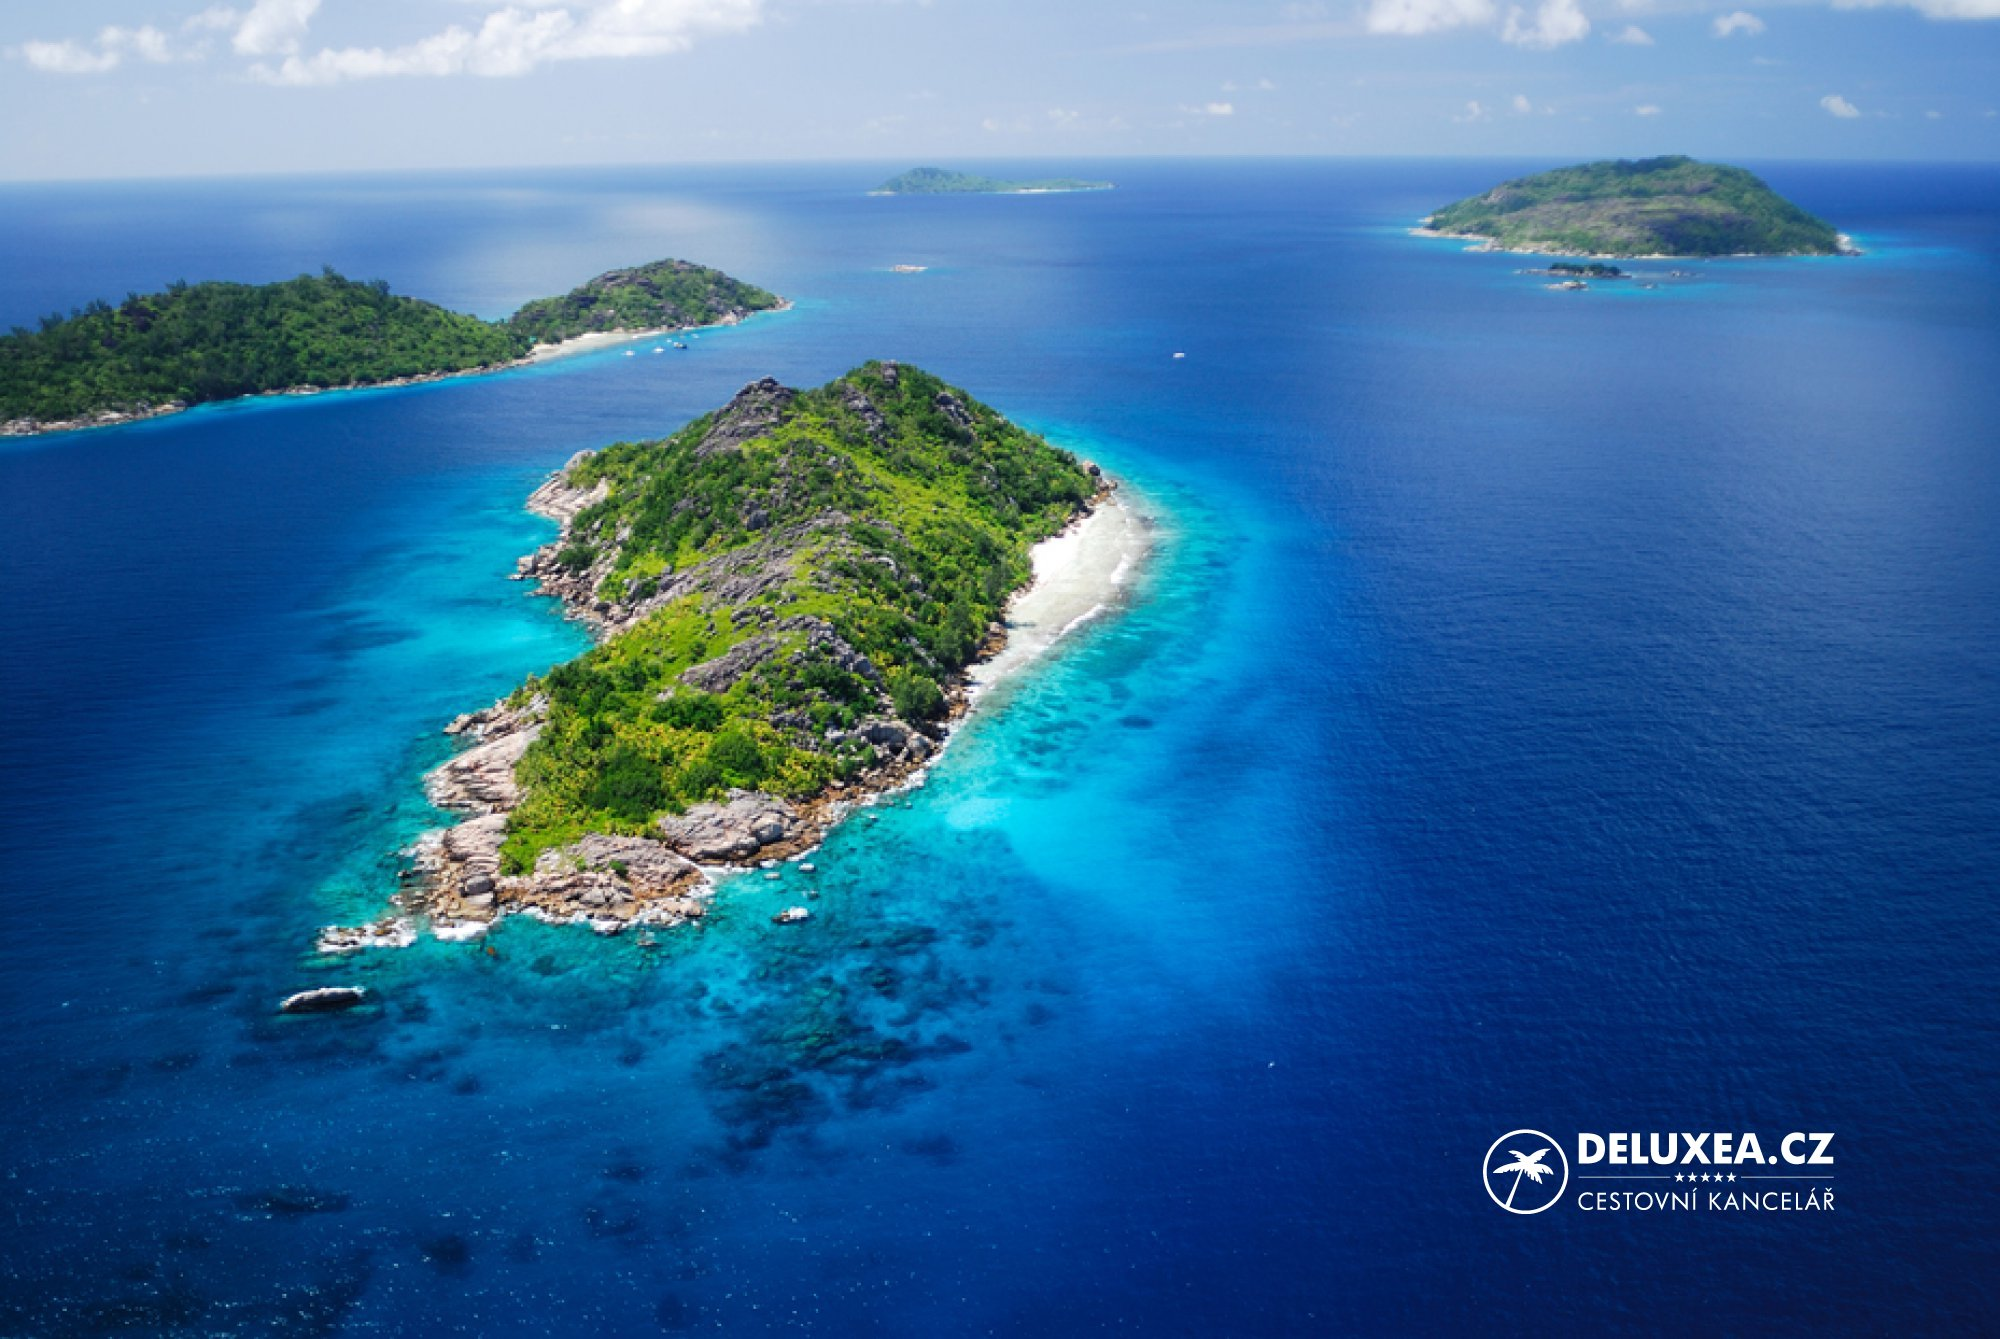 Mapa Seychely Kde Lezi Seychelske Ostrovy Deluxea